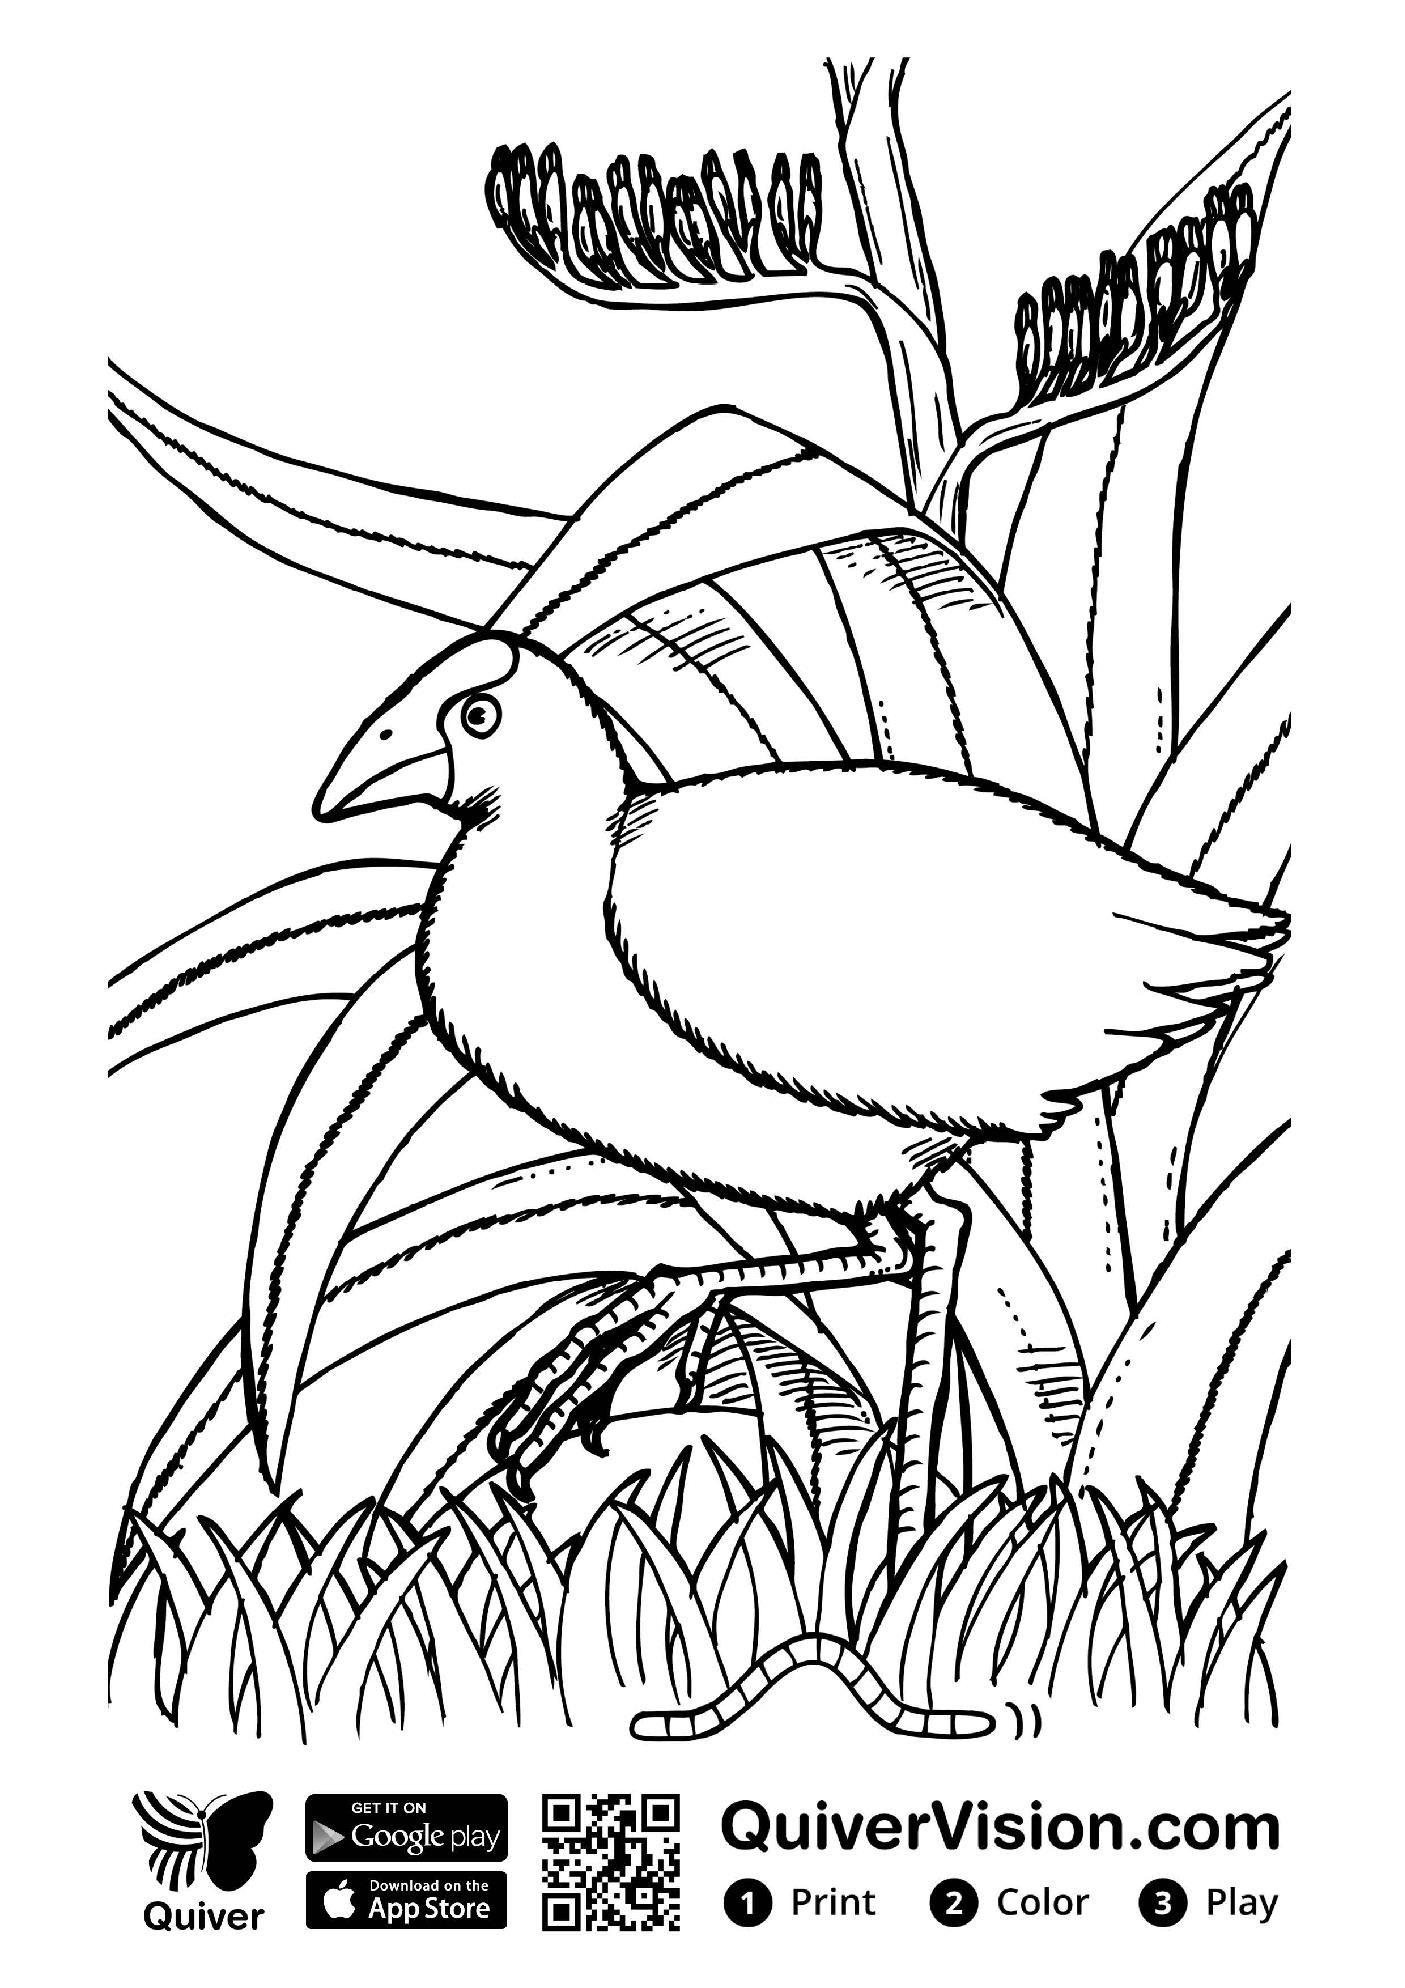 Image Result For Quivervision Coloring Pages Boyama Sayfalari 3d Boyama Artirilmis Gerceklik